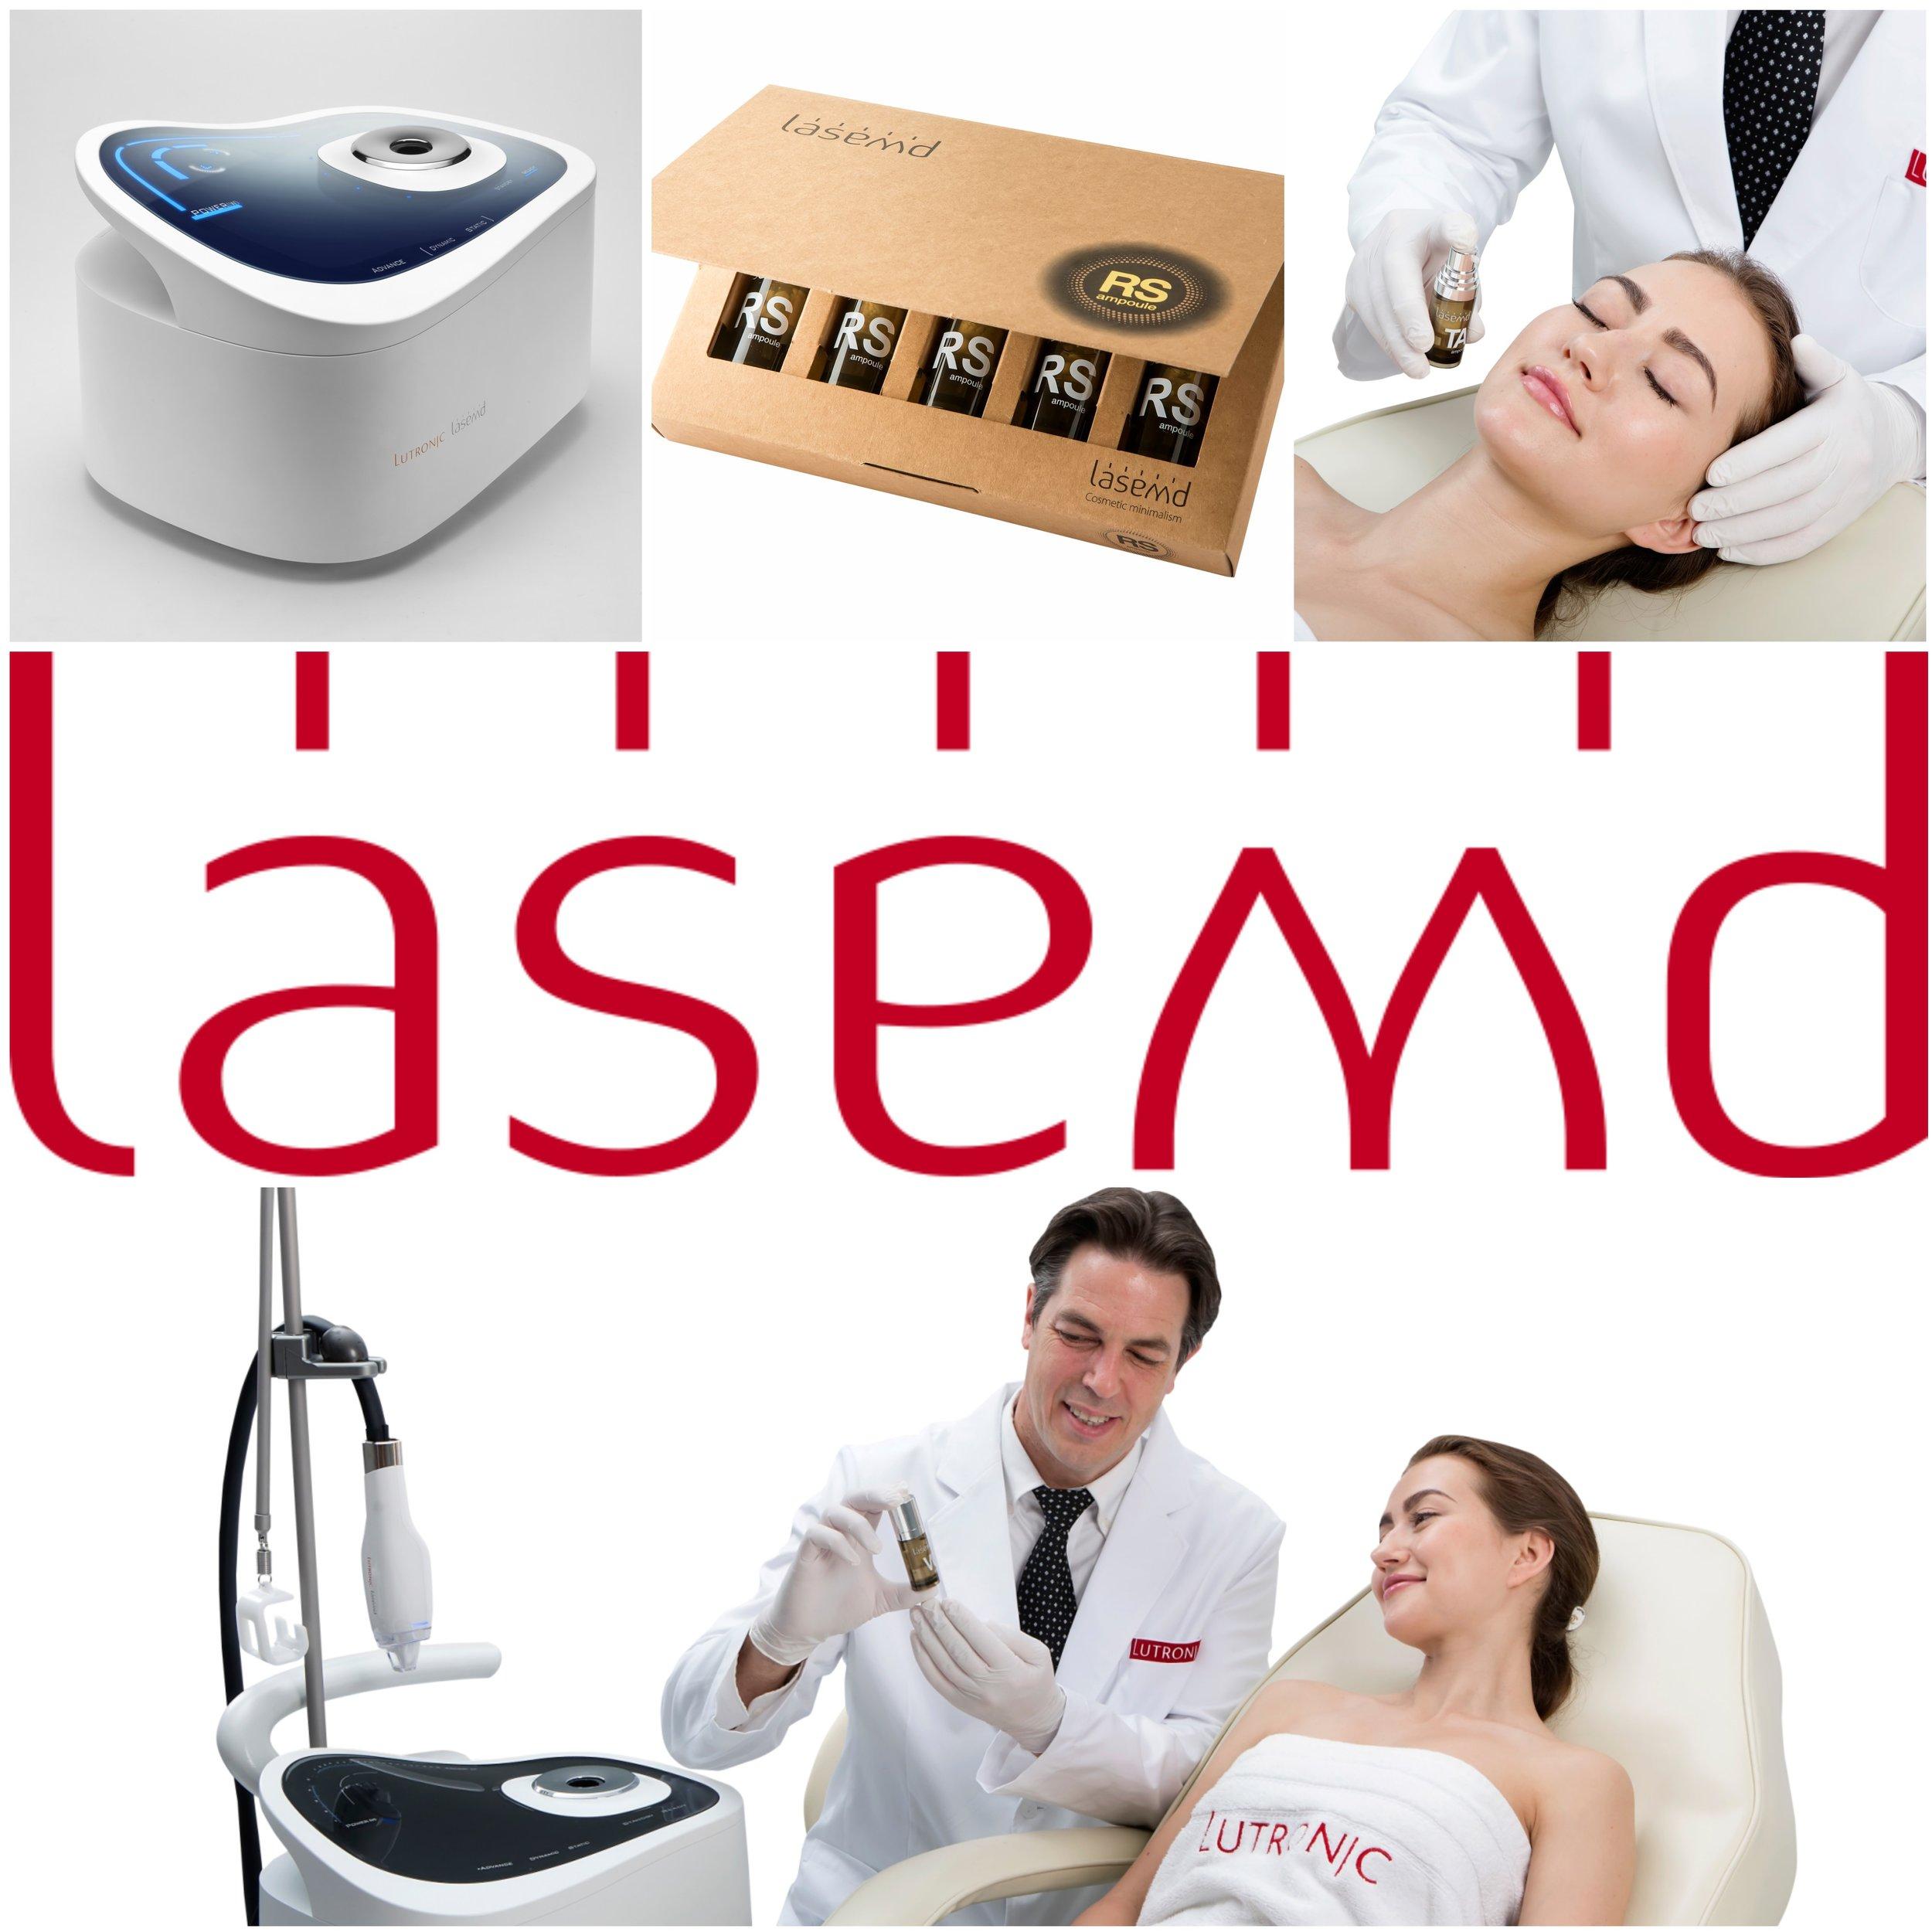 Baby Skin Laser LaseMD LifePlus Clinics